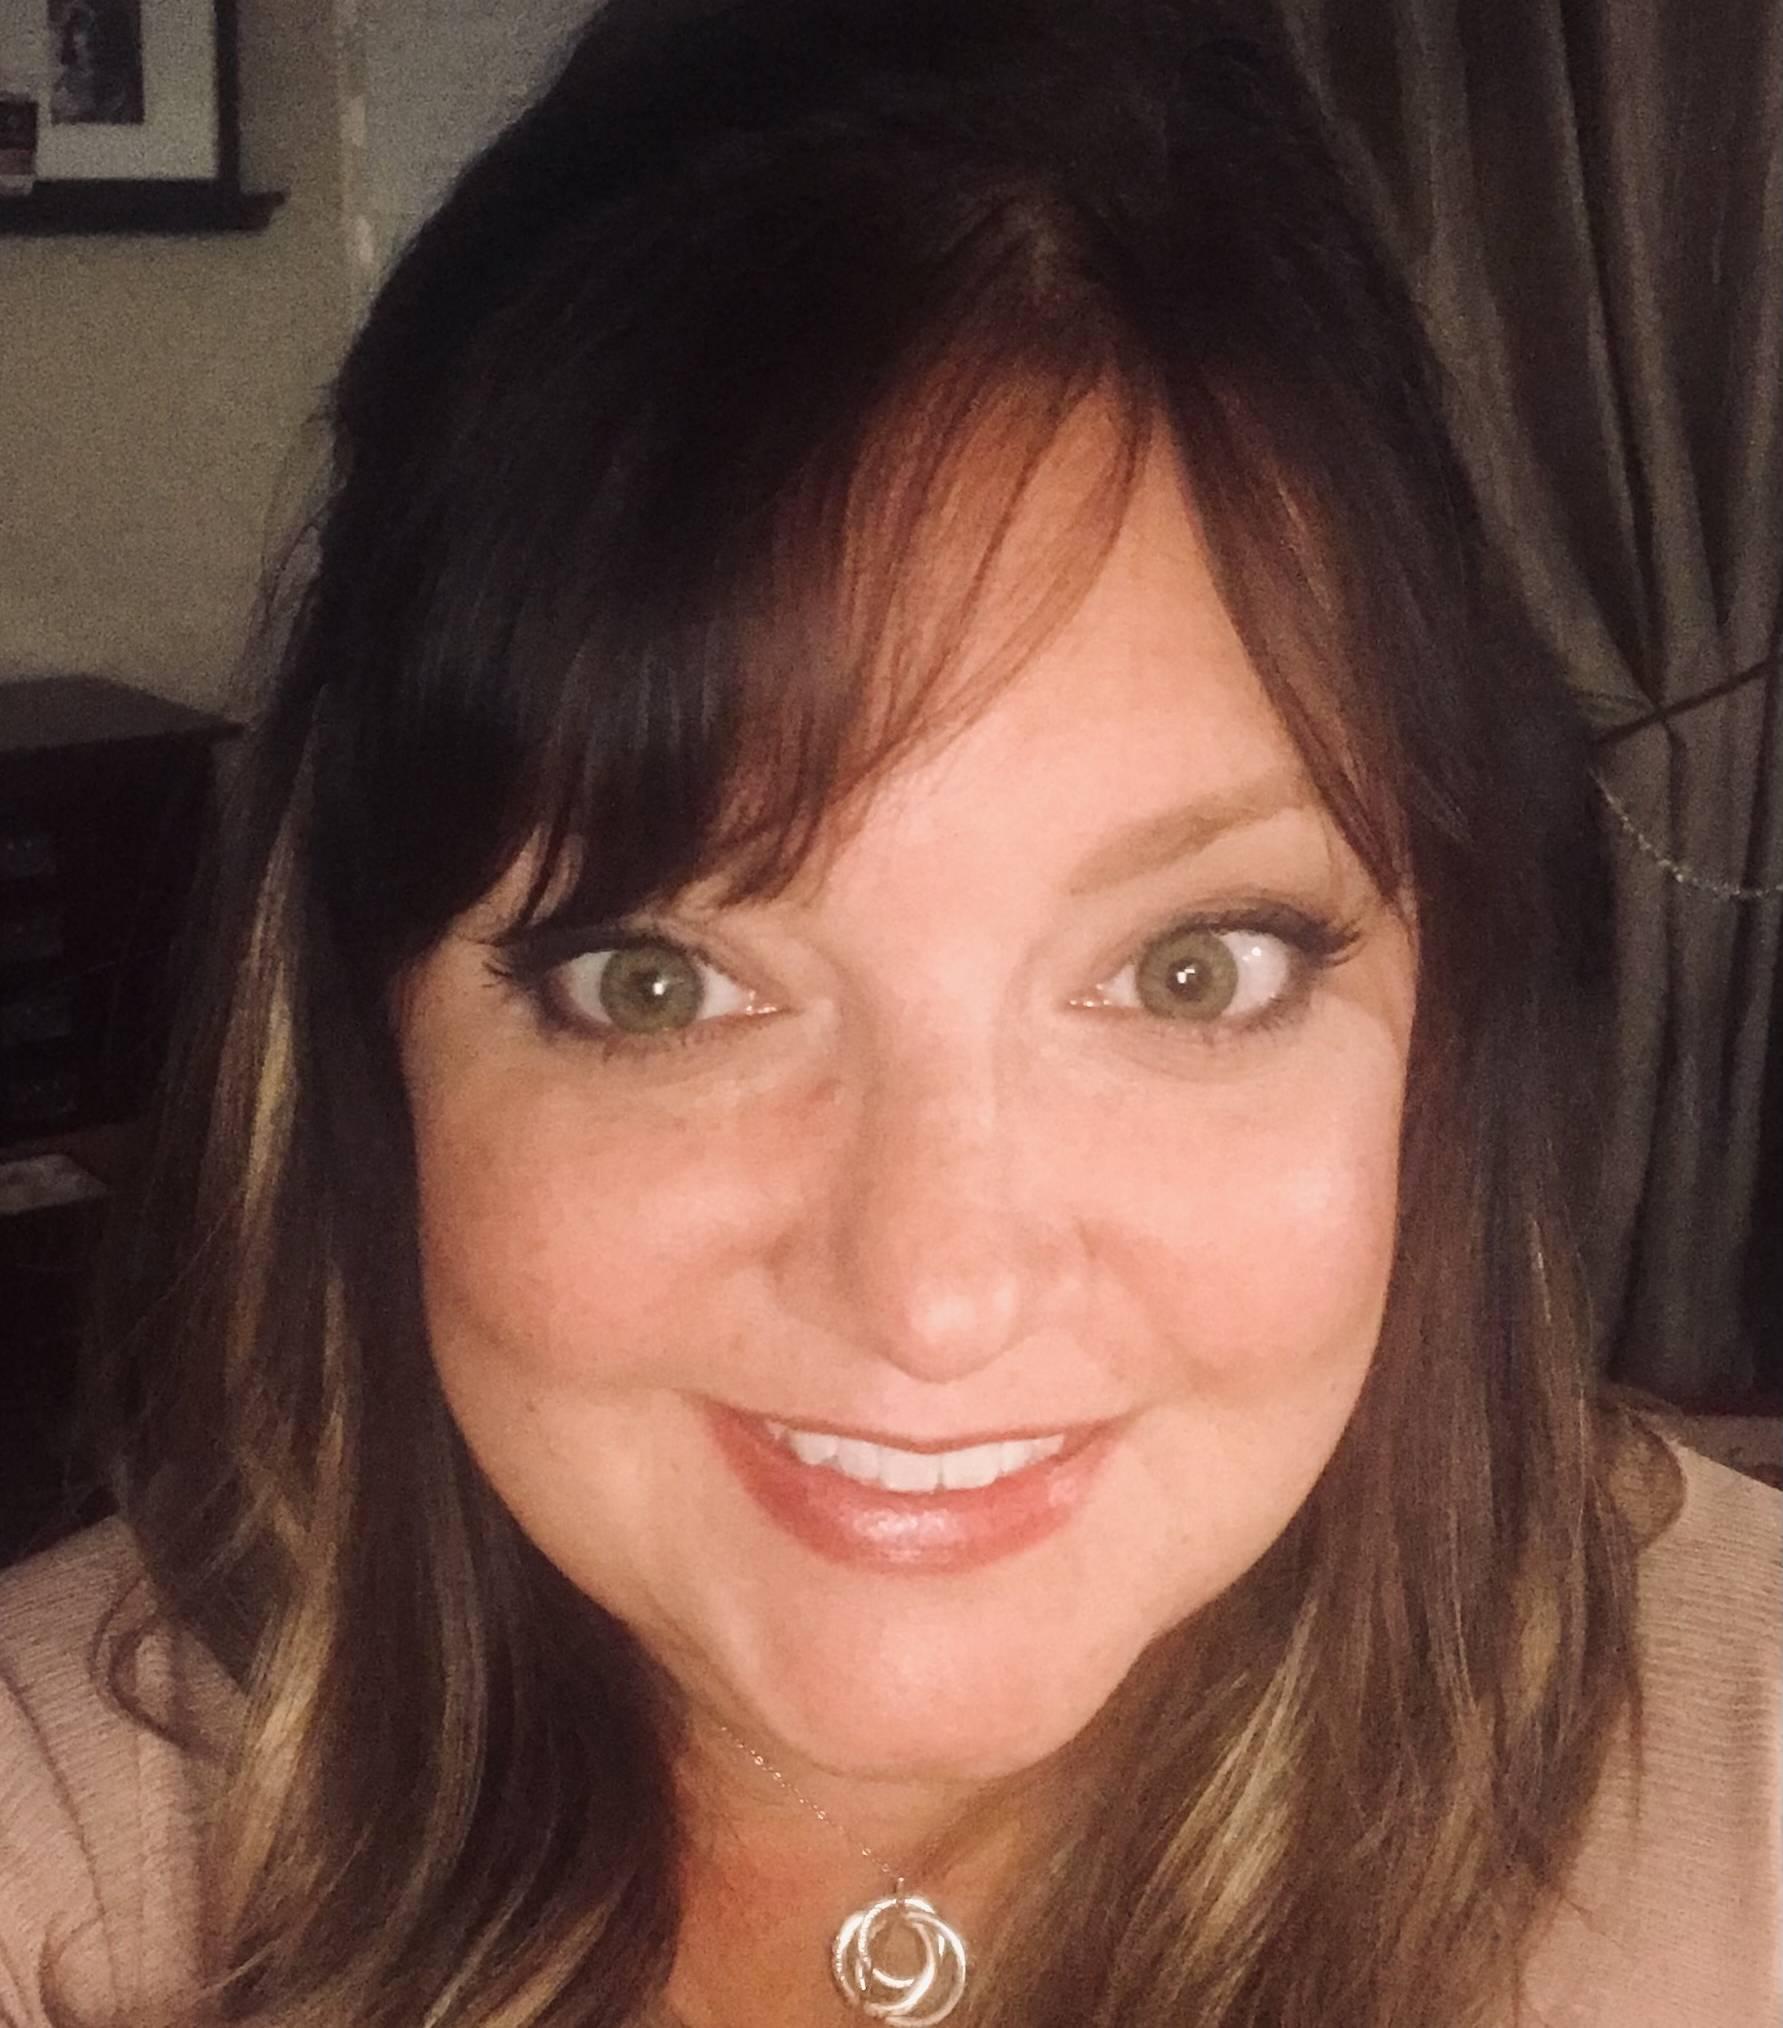 Tiffany Scholle - TeacherMade User